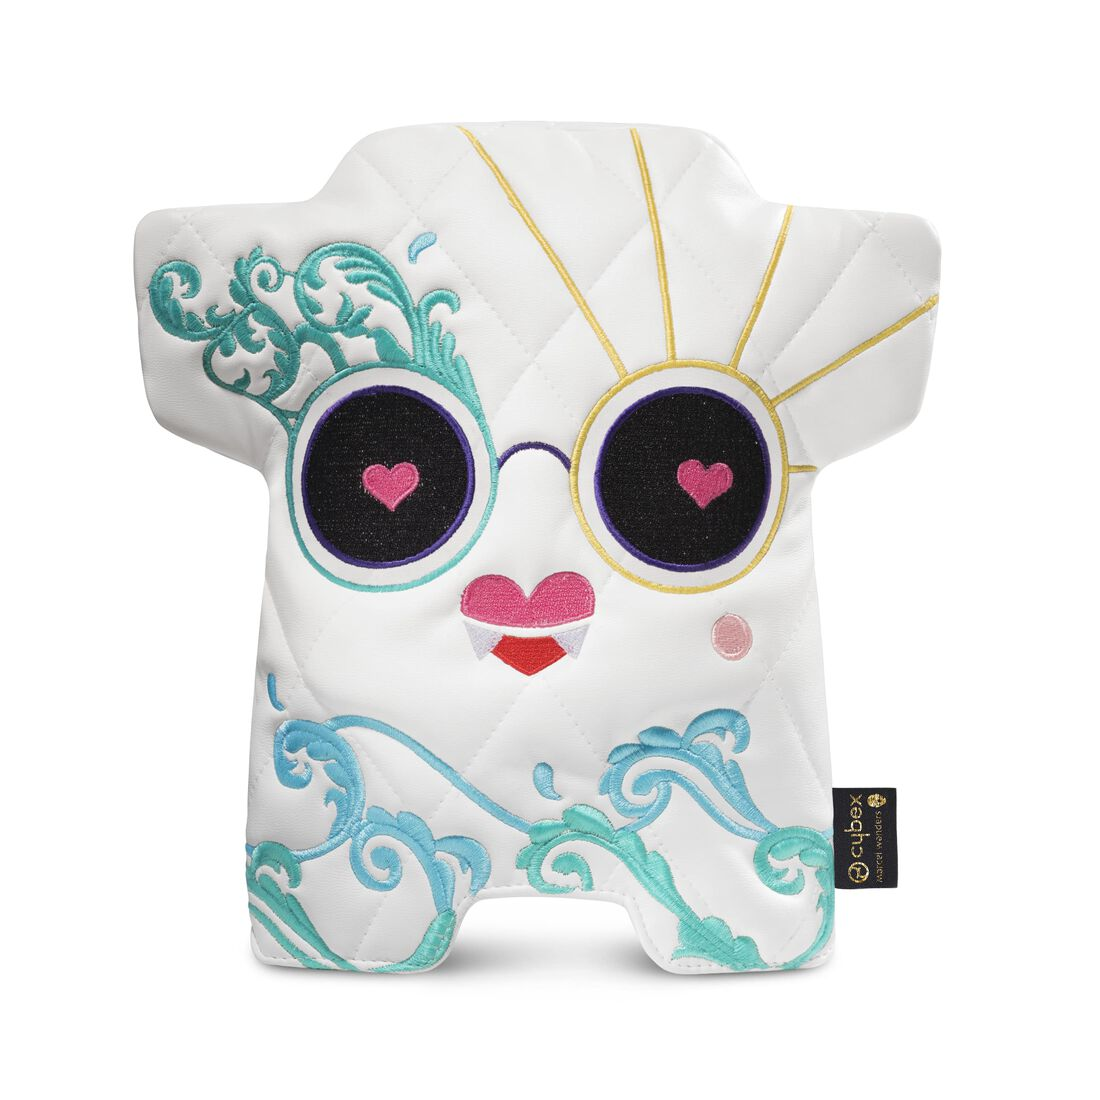 CYBEX Wanders Monster Toy - Love Guru in Love Guru large Bild 1